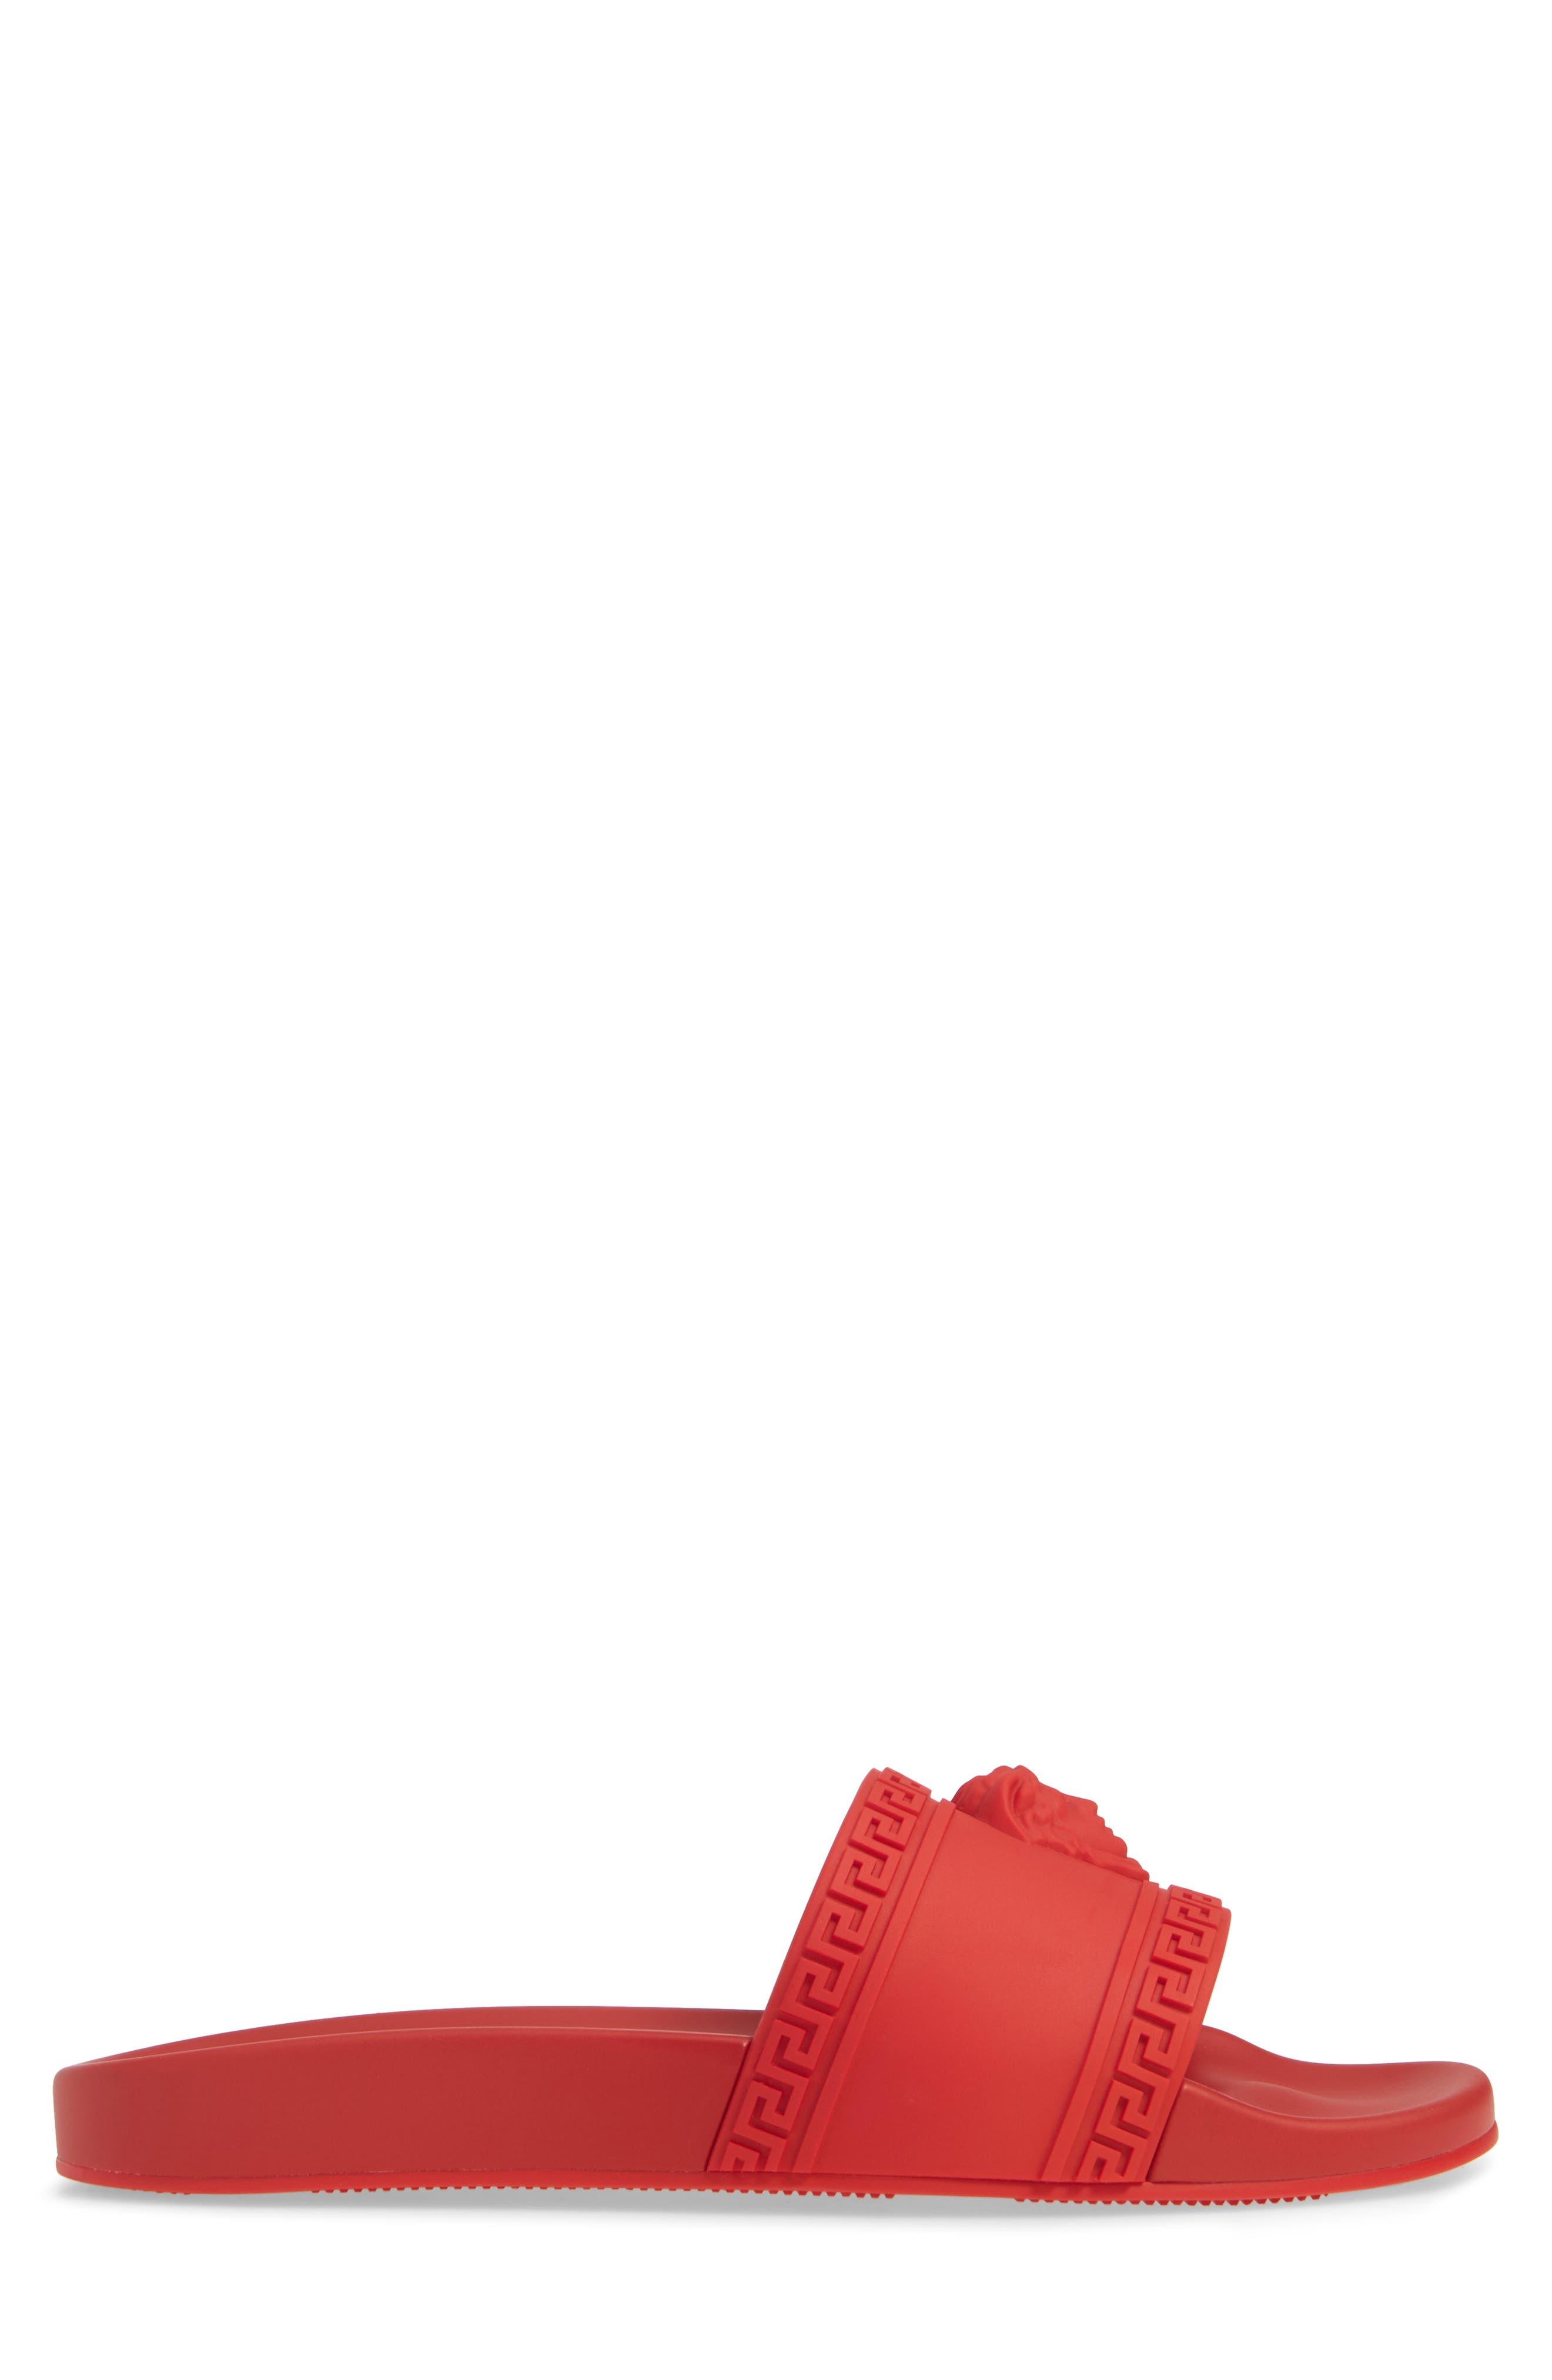 VERSACE, Palazzo Medusa Slide Sandal, Alternate thumbnail 3, color, RED